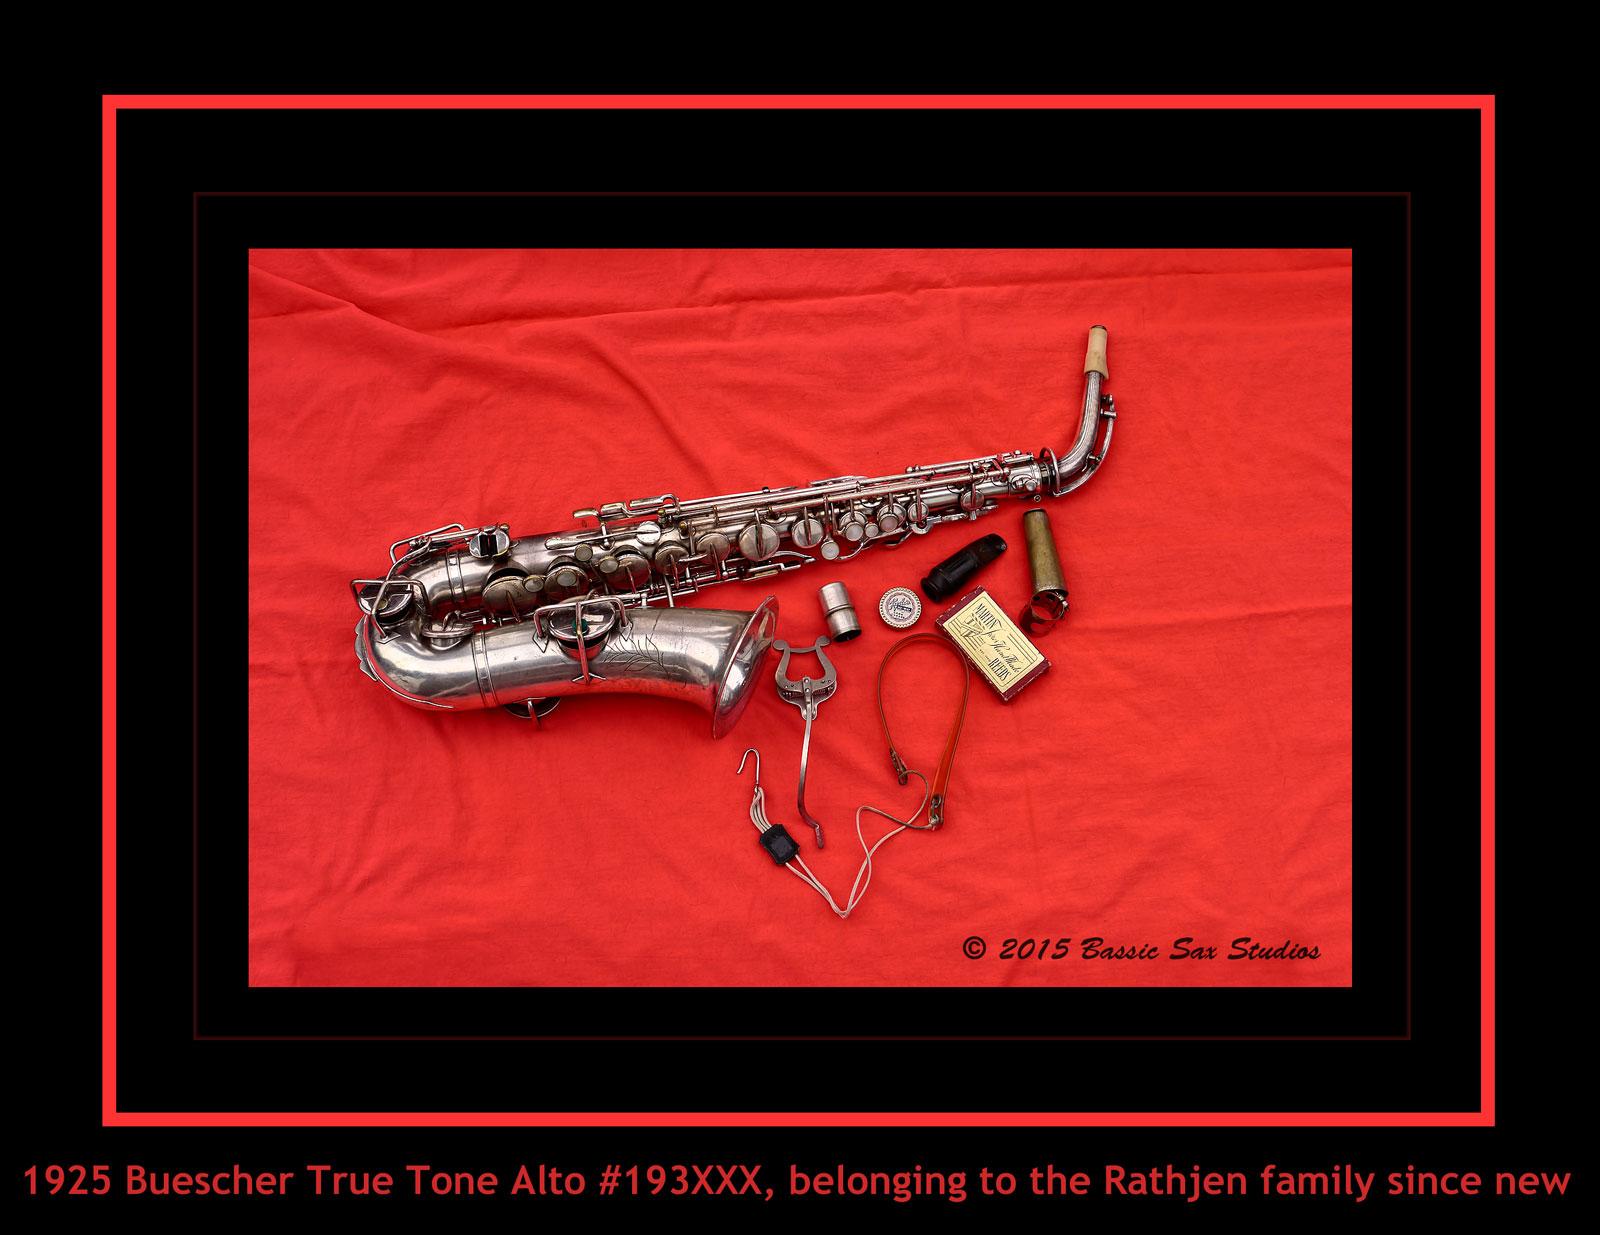 vintage American saxophone, alto sax, Buescher True Tone saxophone, silver sax, vintage accesories,